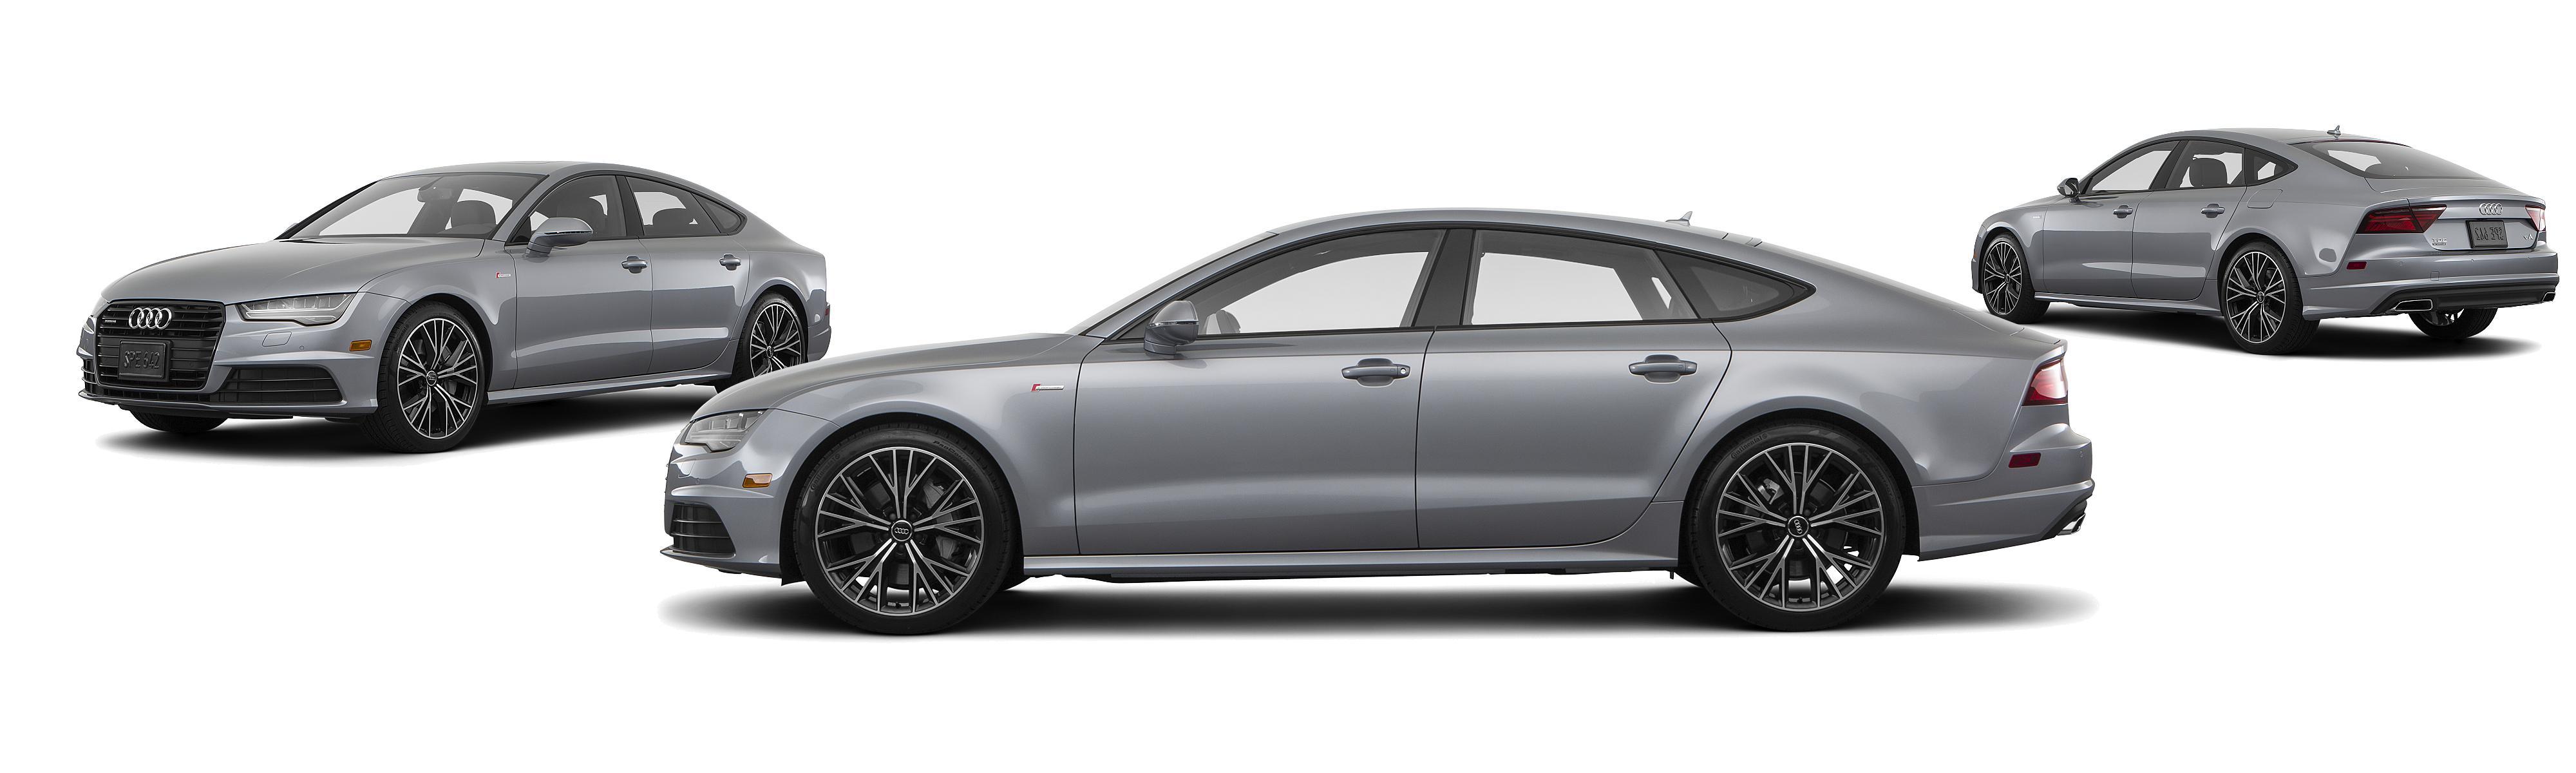 Audi A AWD T Quattro Premium Plus Dr Sportback Research - Audi a7 invoice price